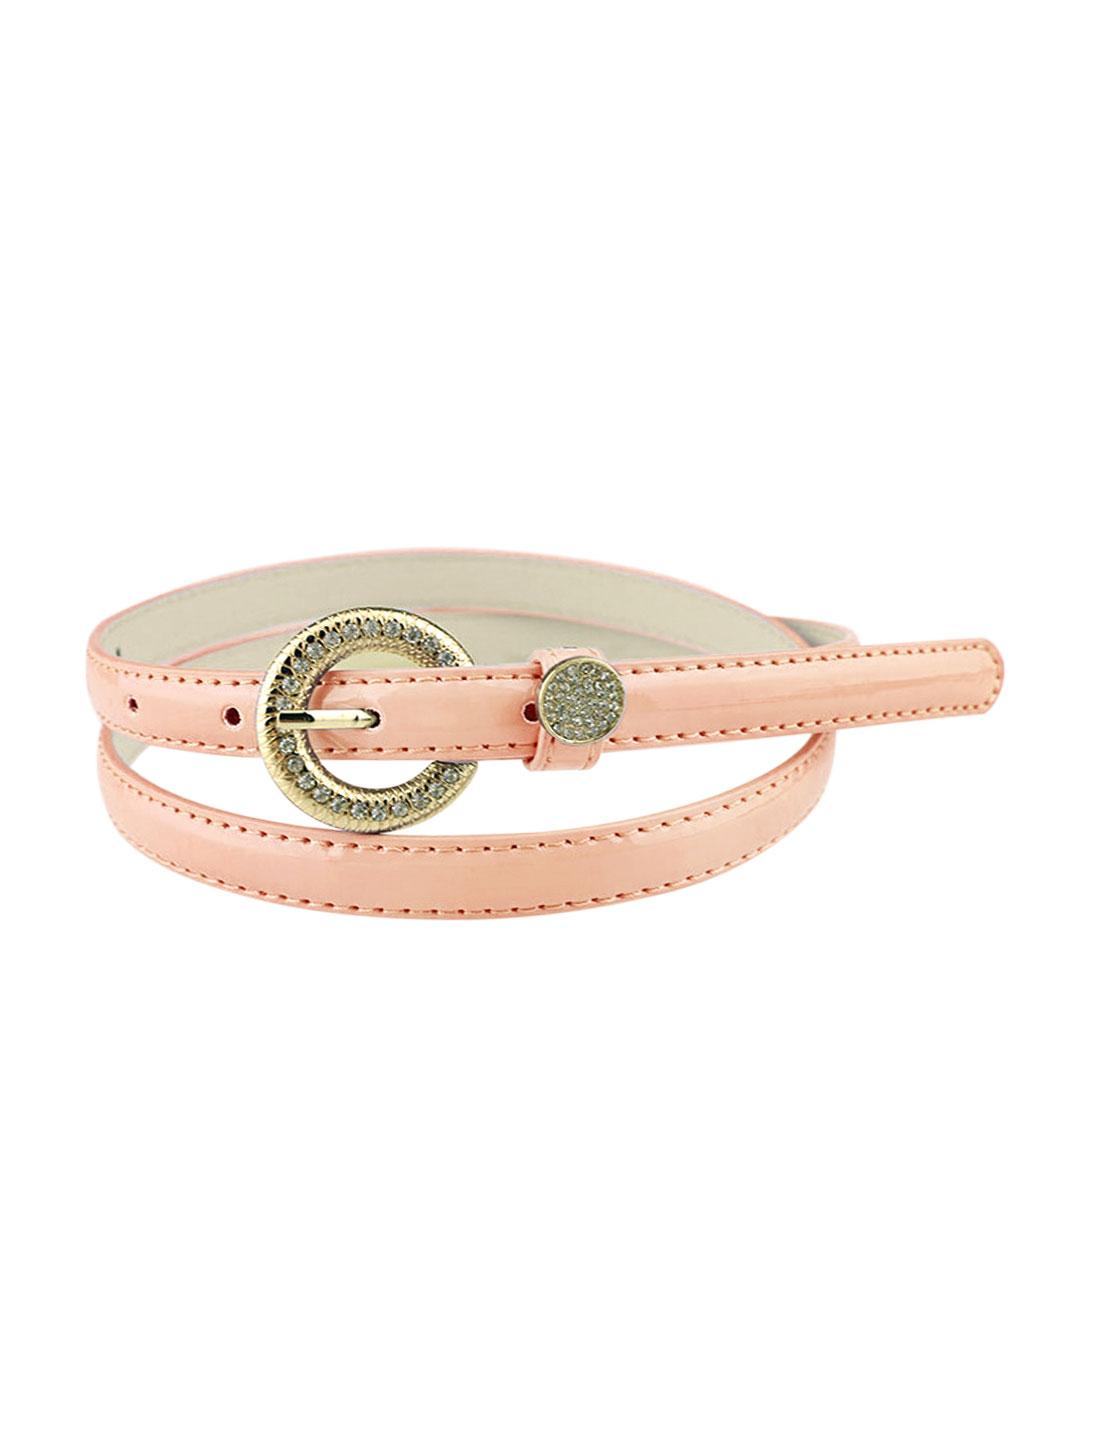 Women Rhinestone Decor Single Pin Buckle Waist Belt Pink